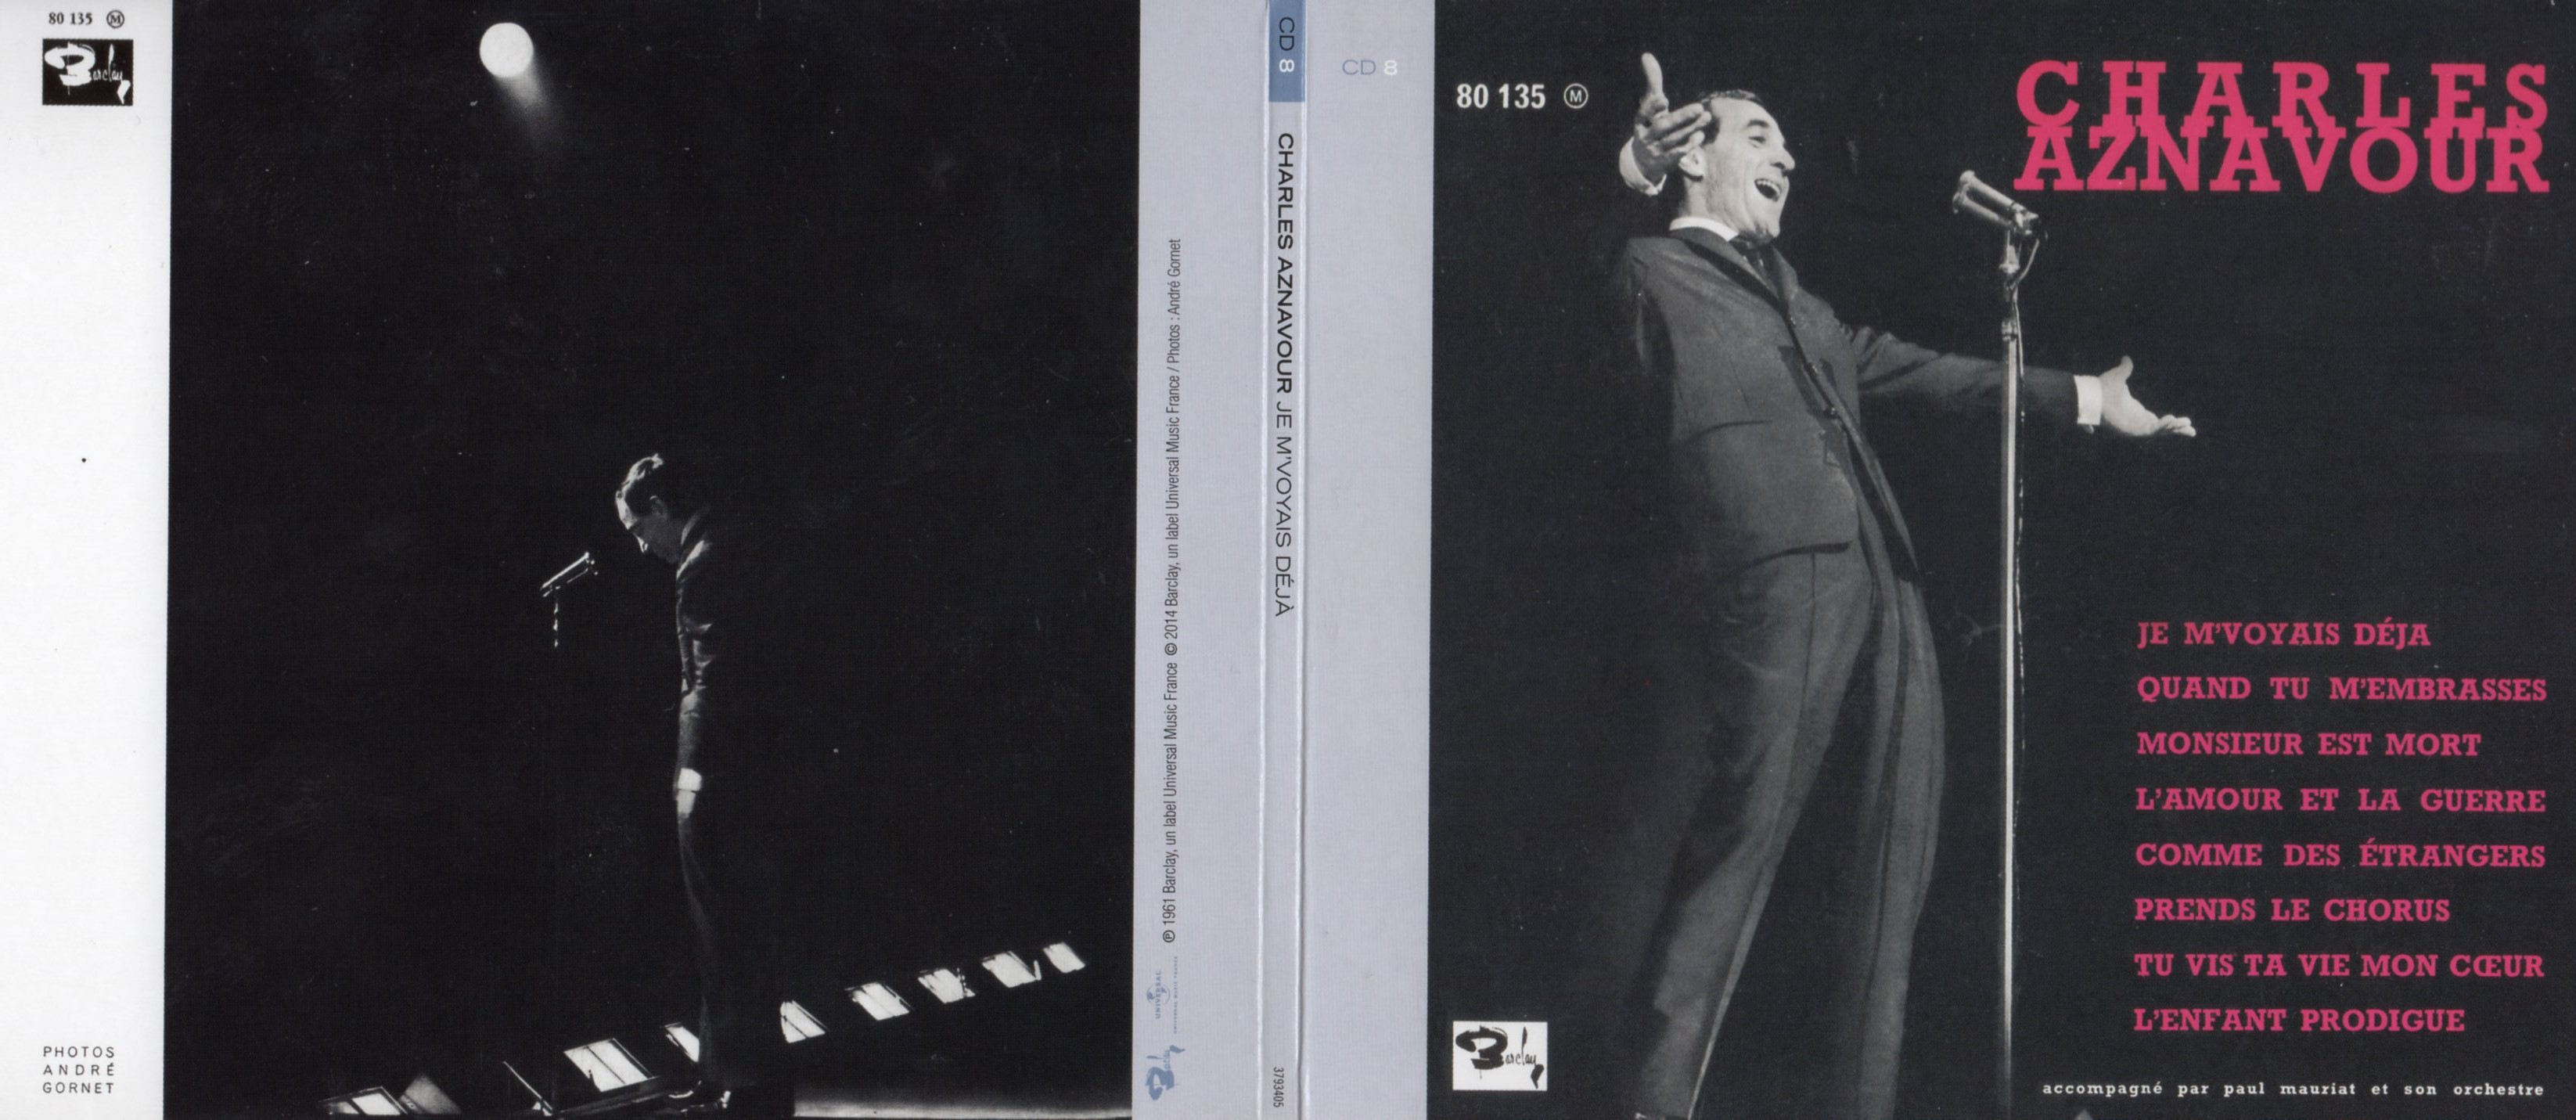 CHARLES AZNAVOUR - Je m'voyais déjà (1961) Gatefold Card board sleeve Replica - CD